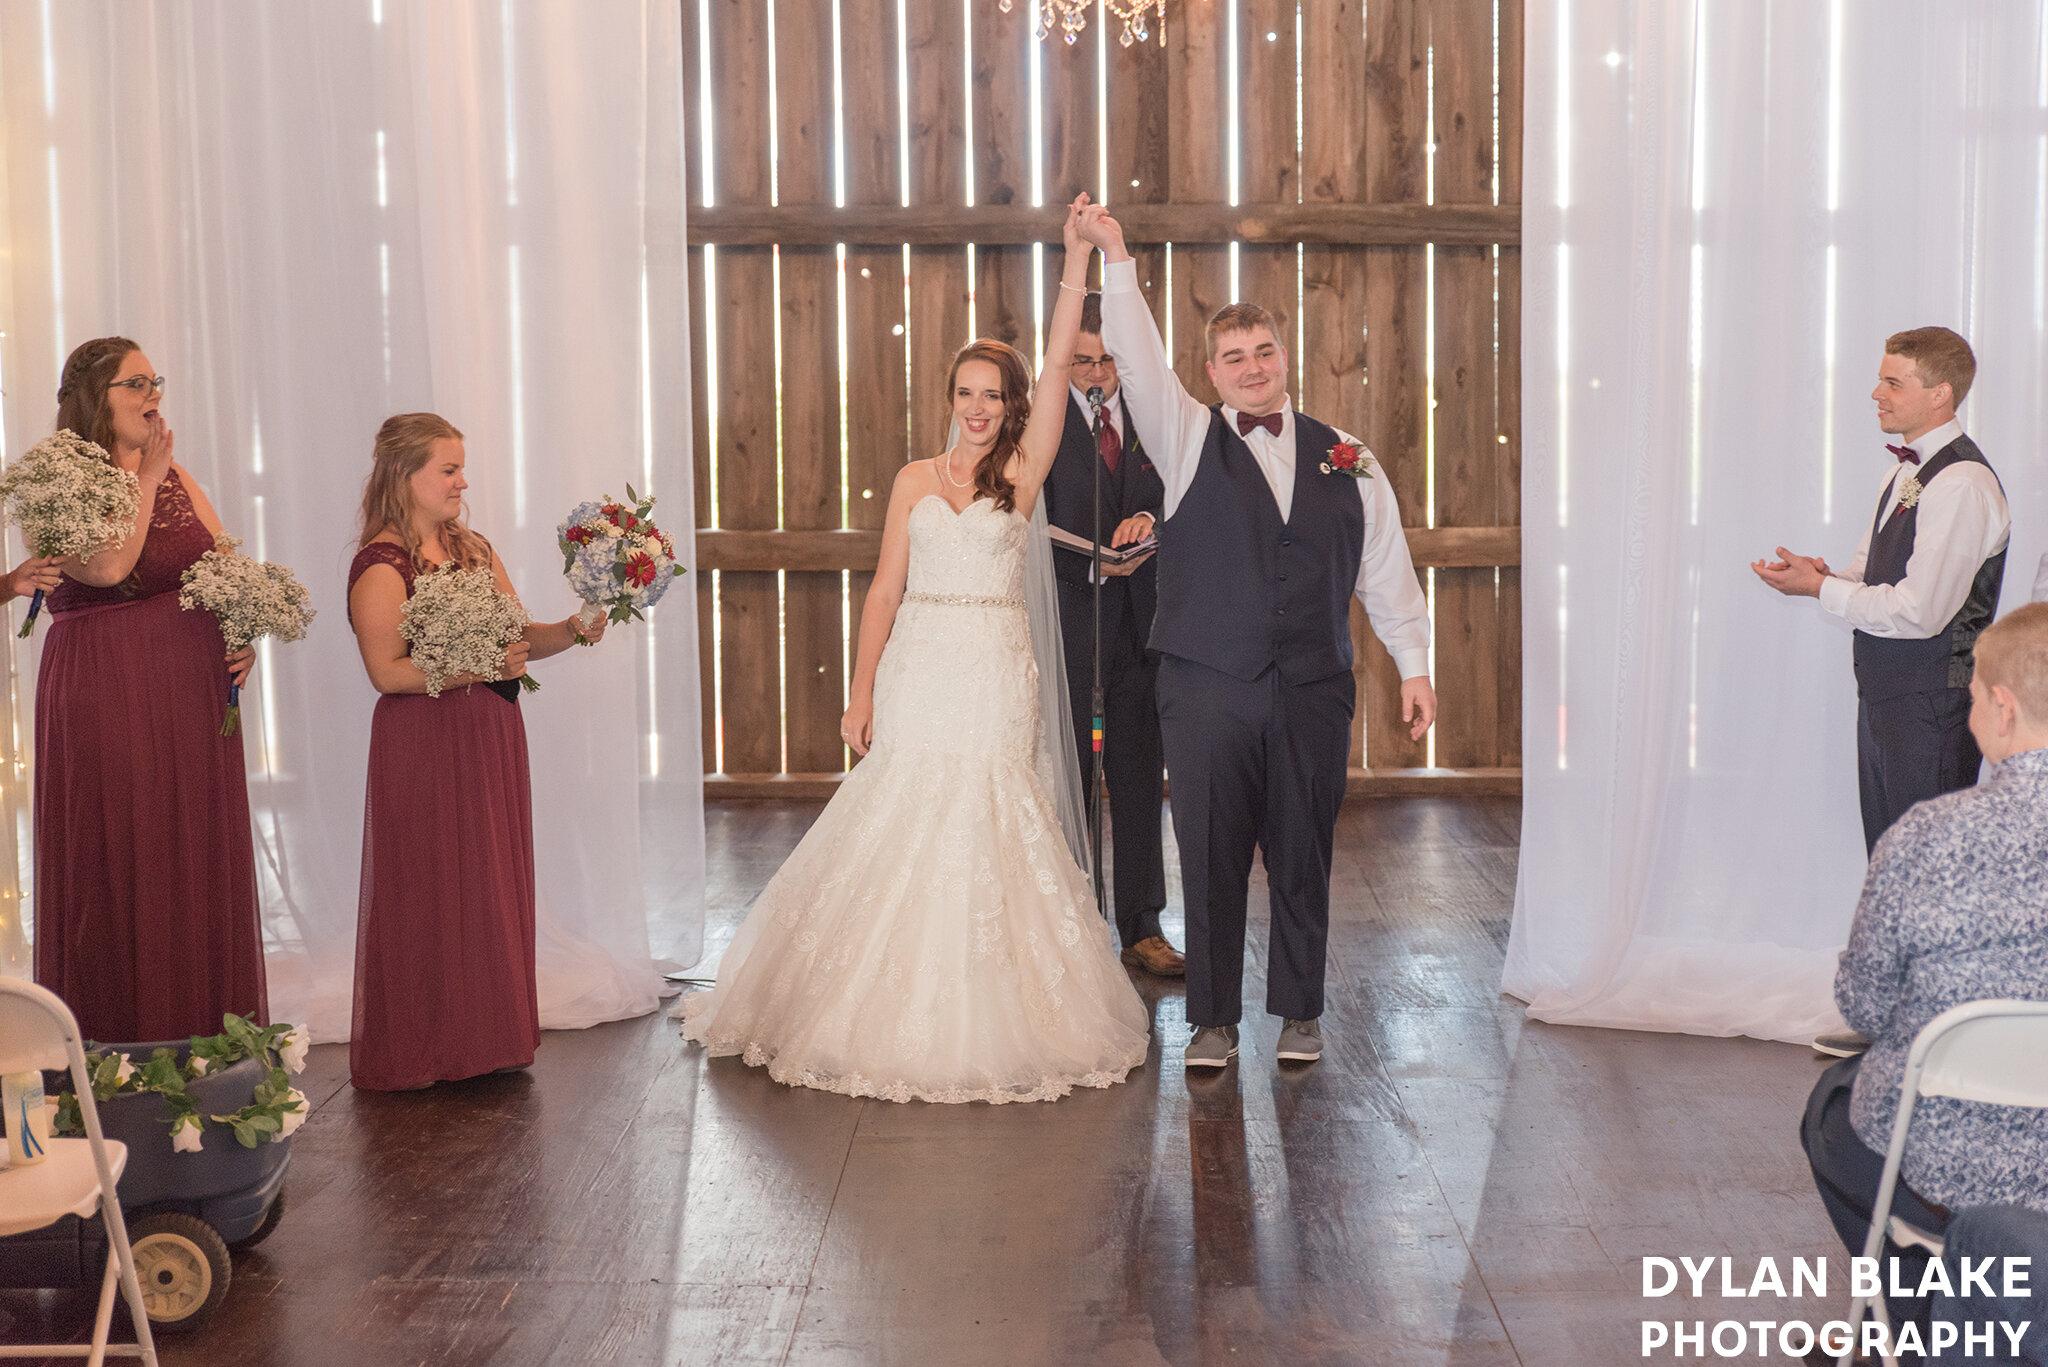 ryan-and-billy-brighton-acres-wedding0022.jpg